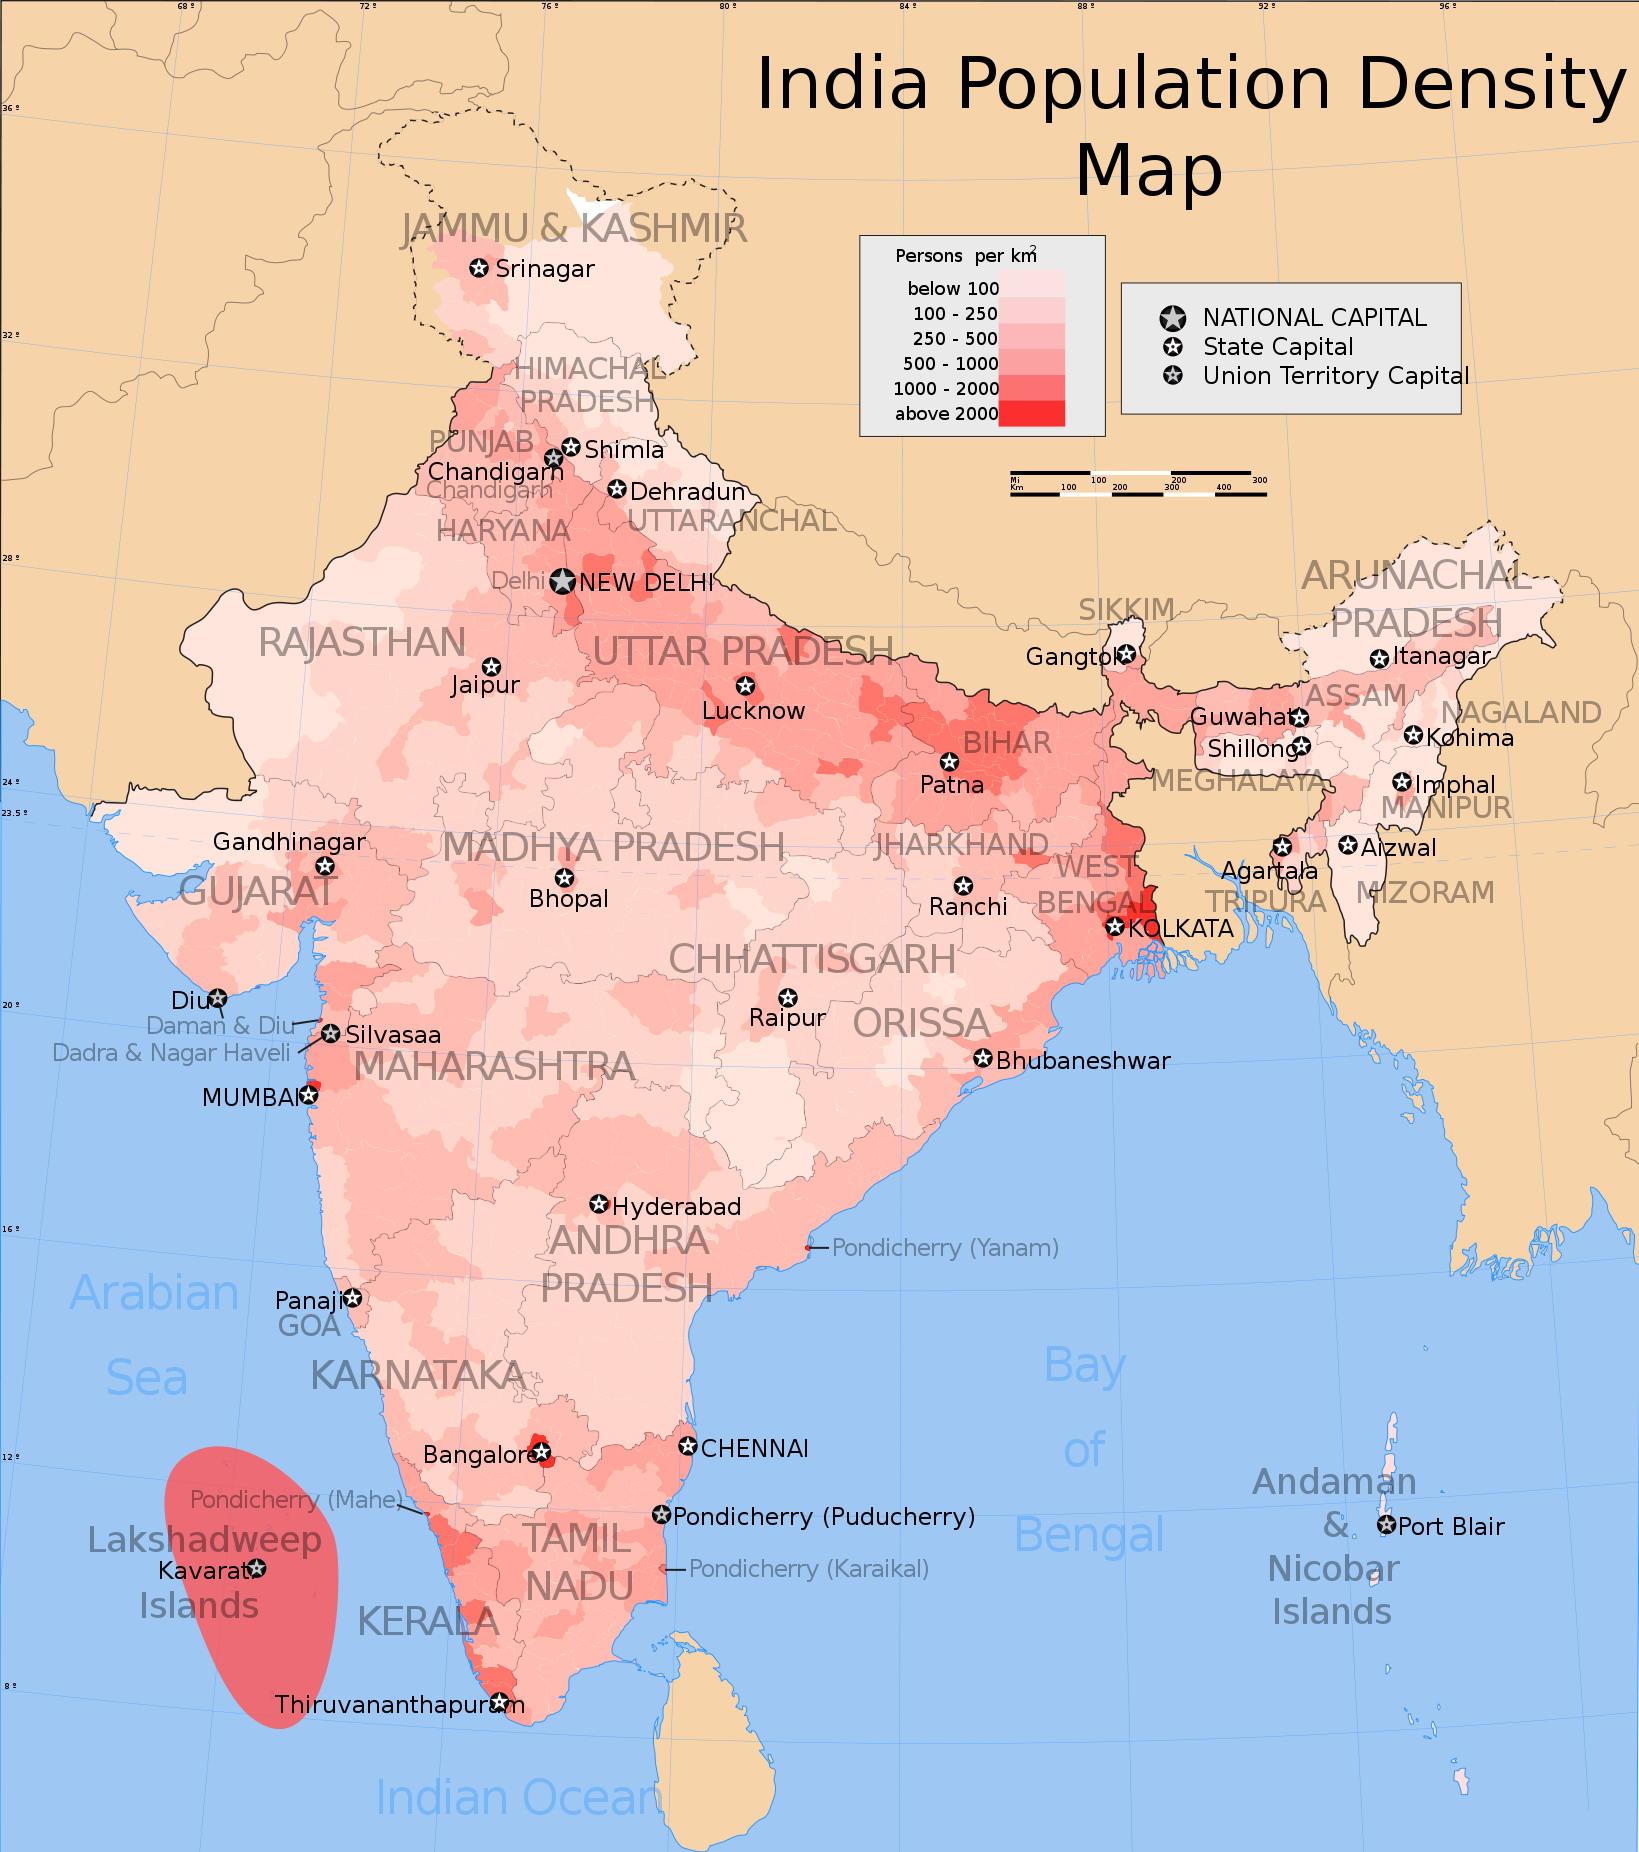 Asisbiz photo's of India